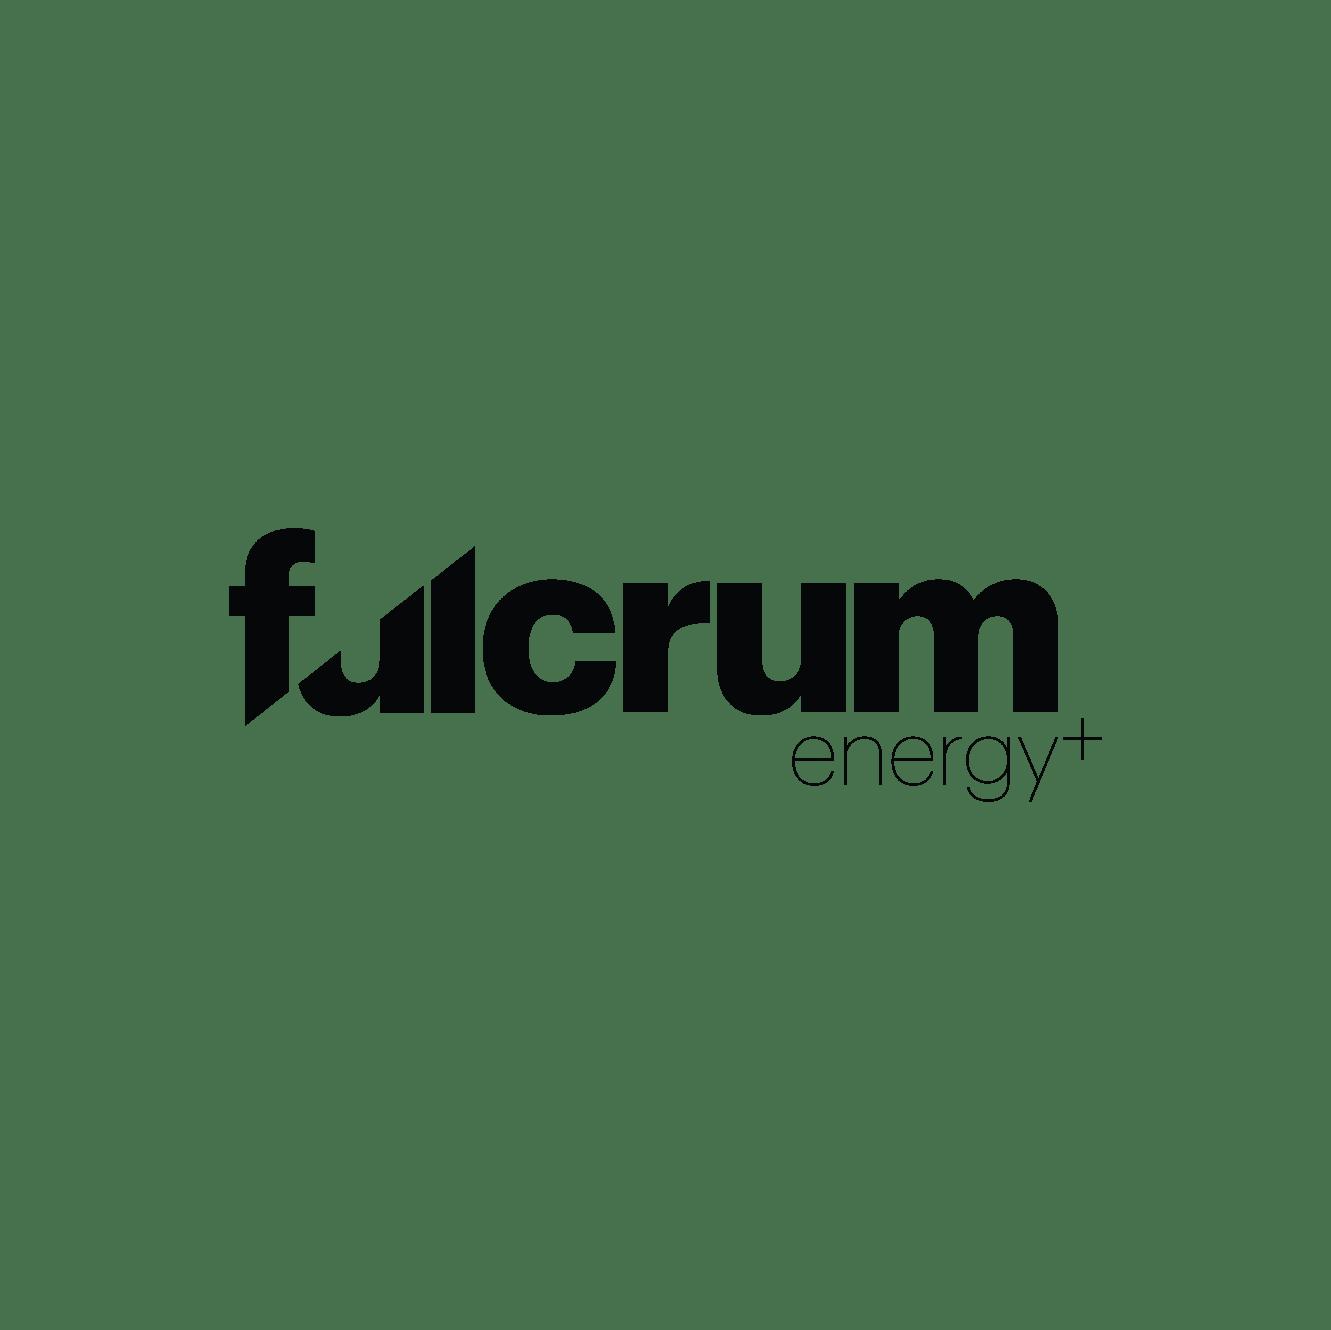 fulcrum_logosinitialselects_020419-19